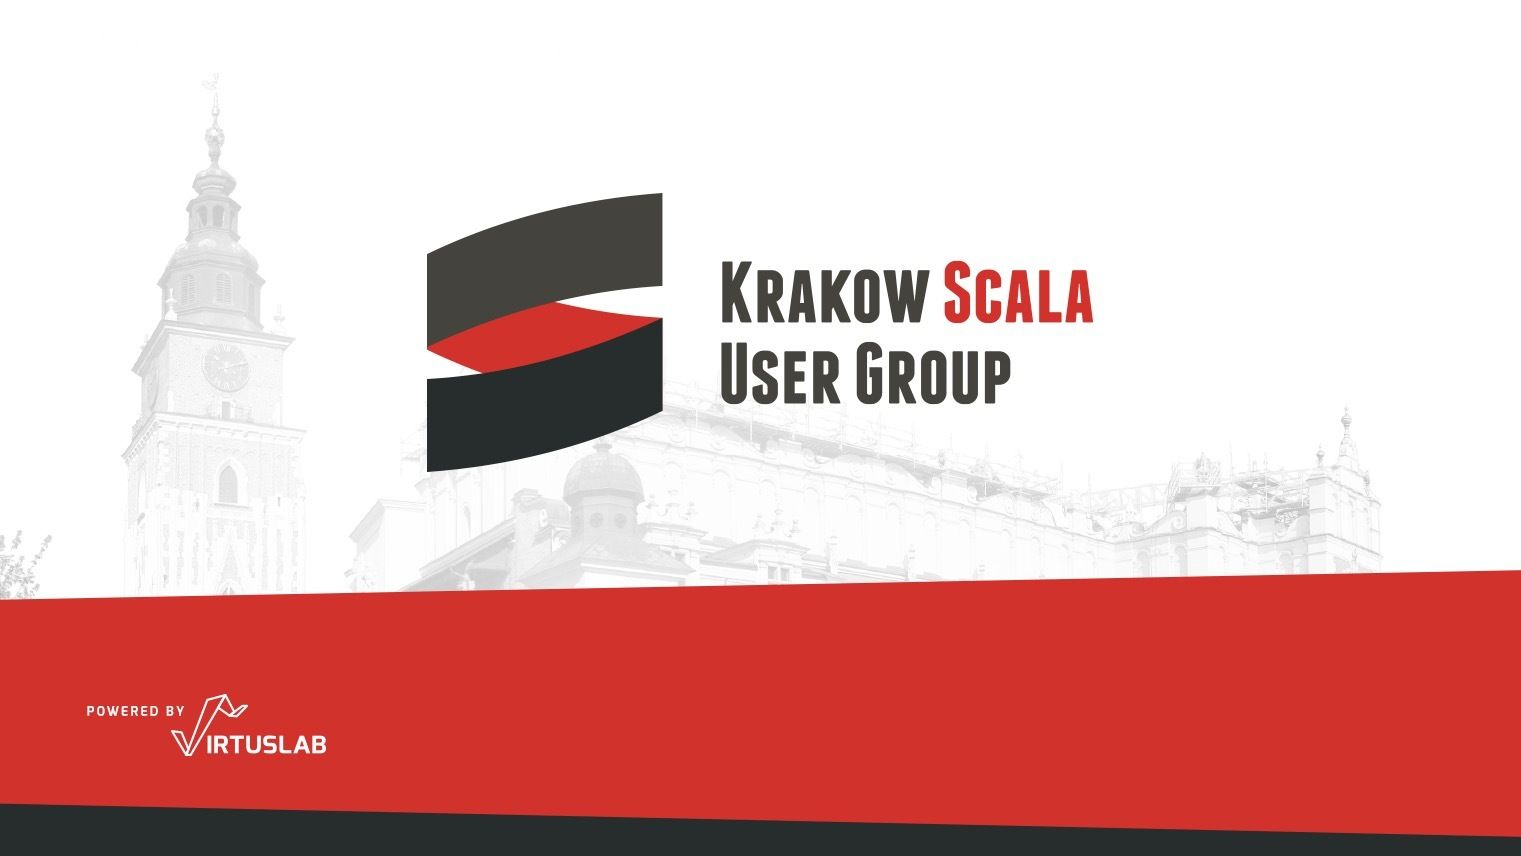 Krakow Scala User Group